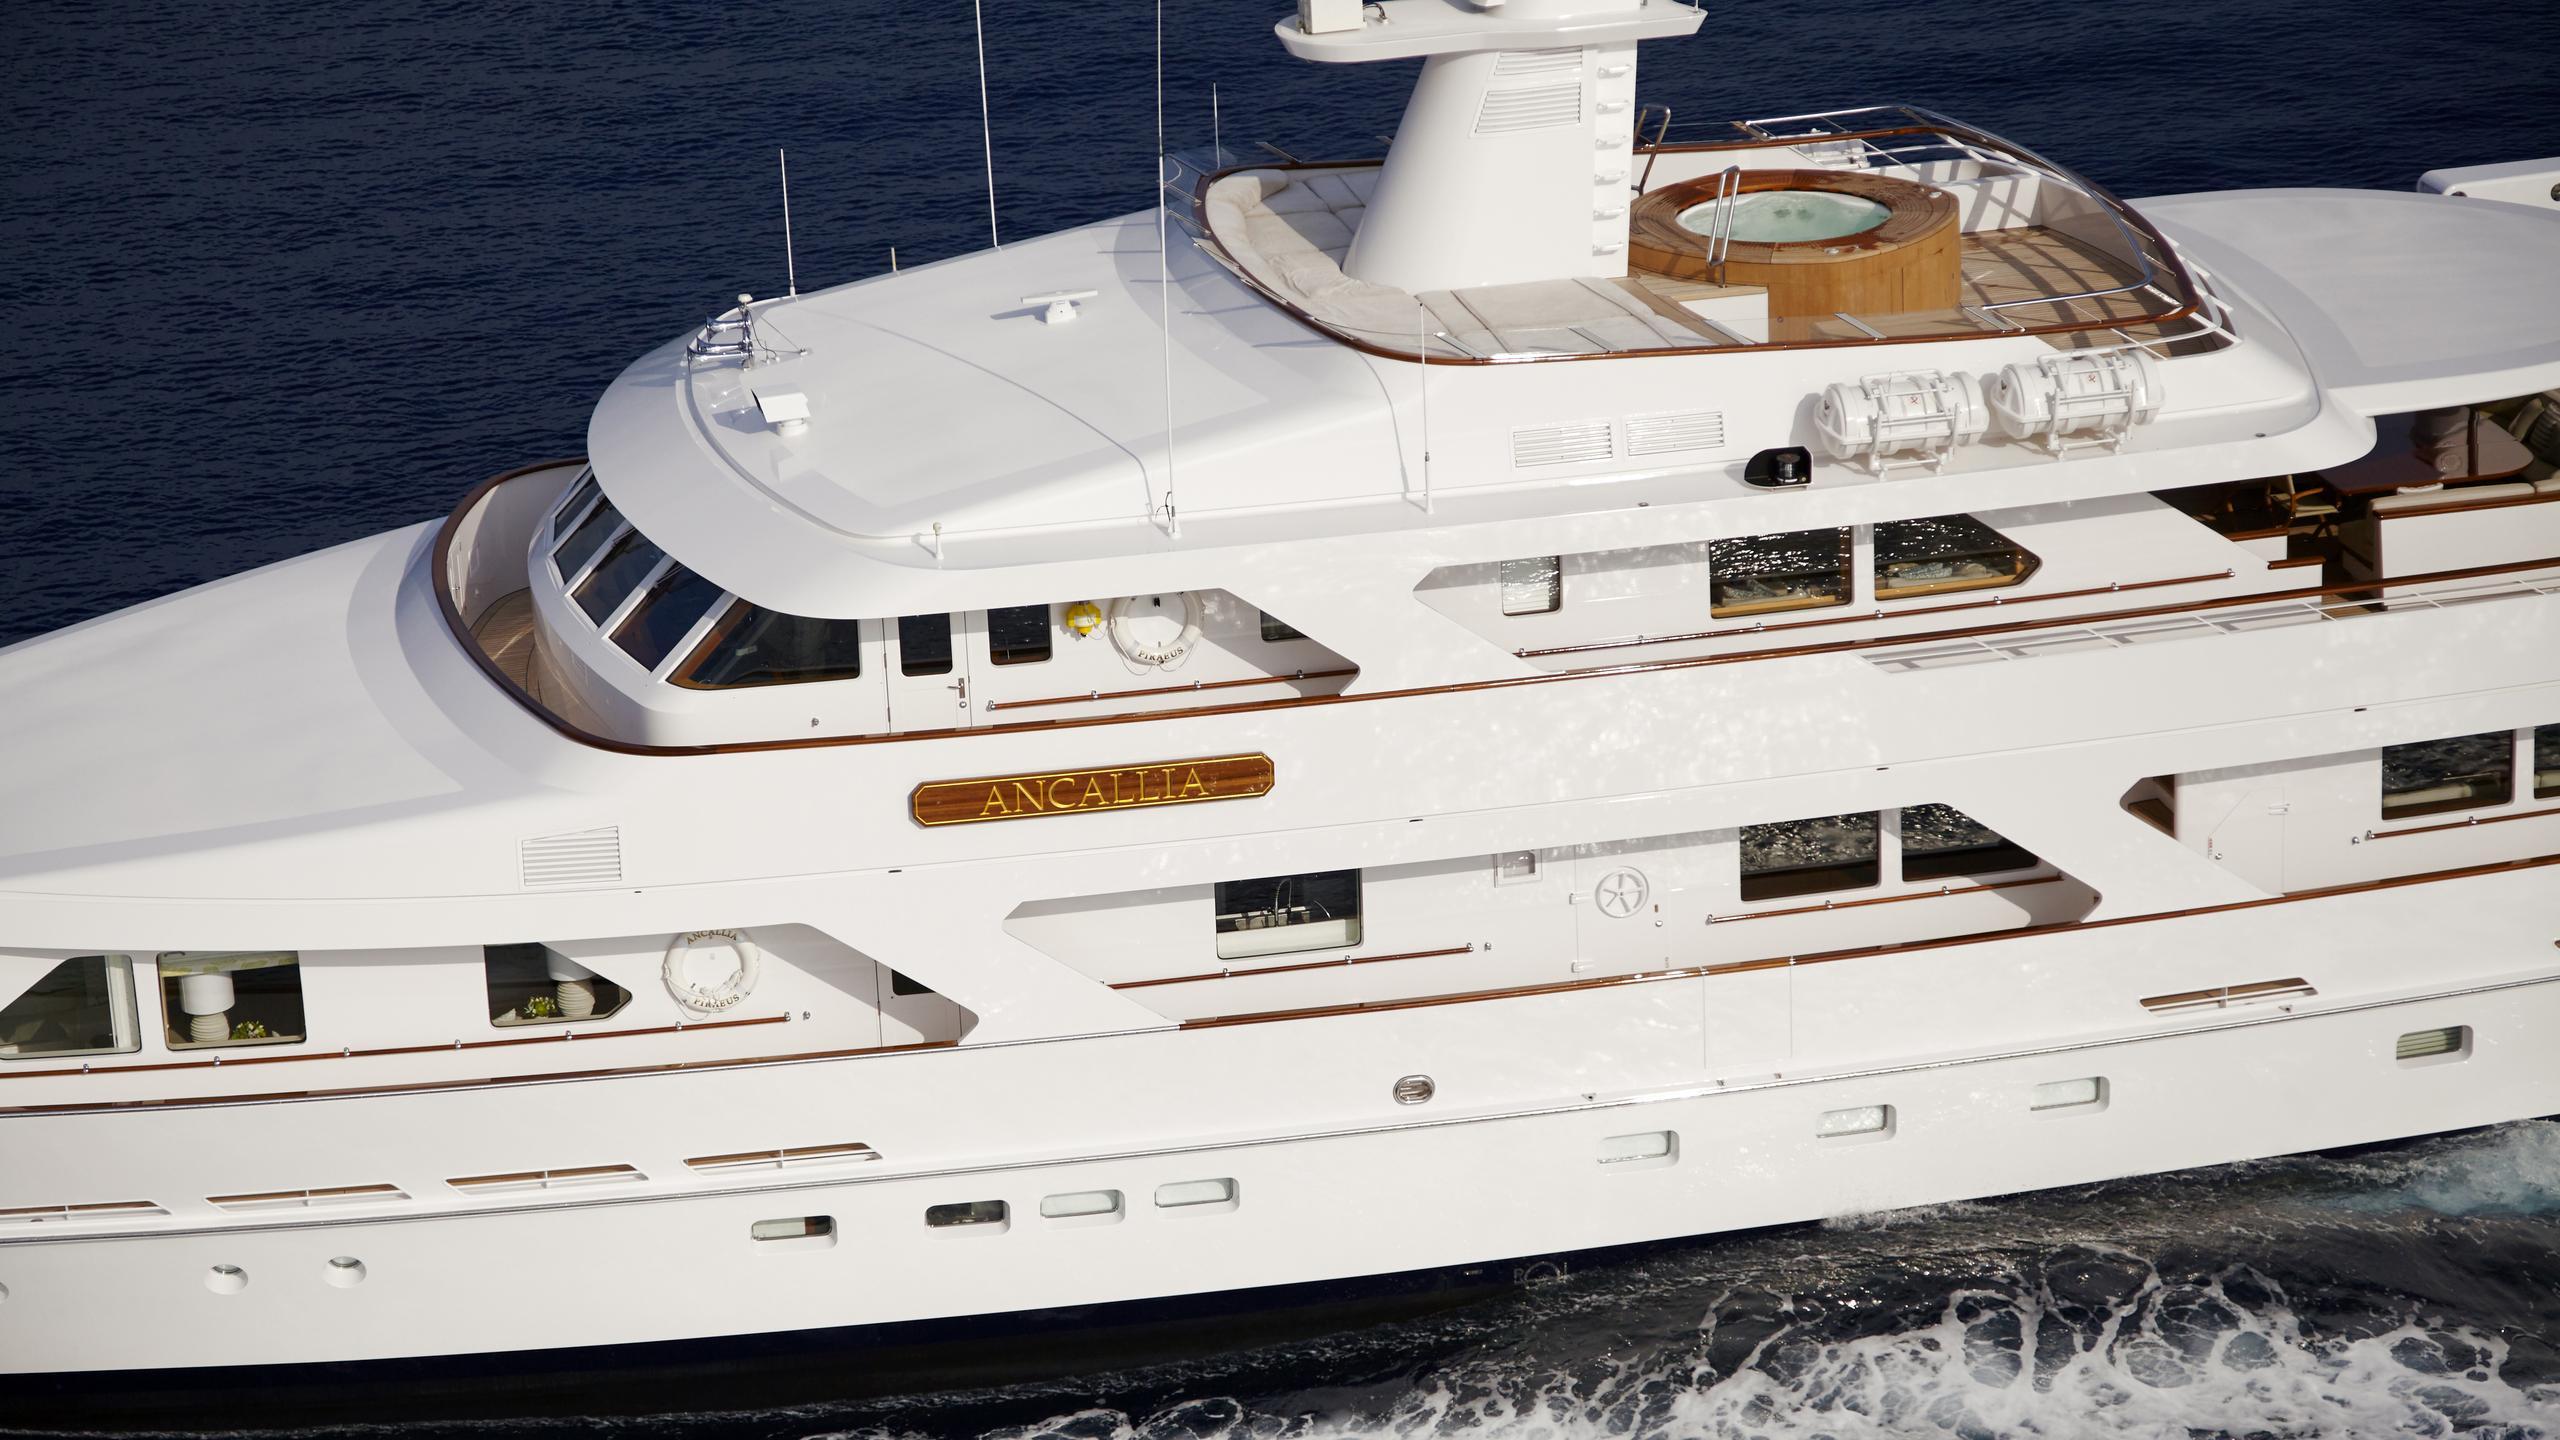 ancallia-yacht-profile-near